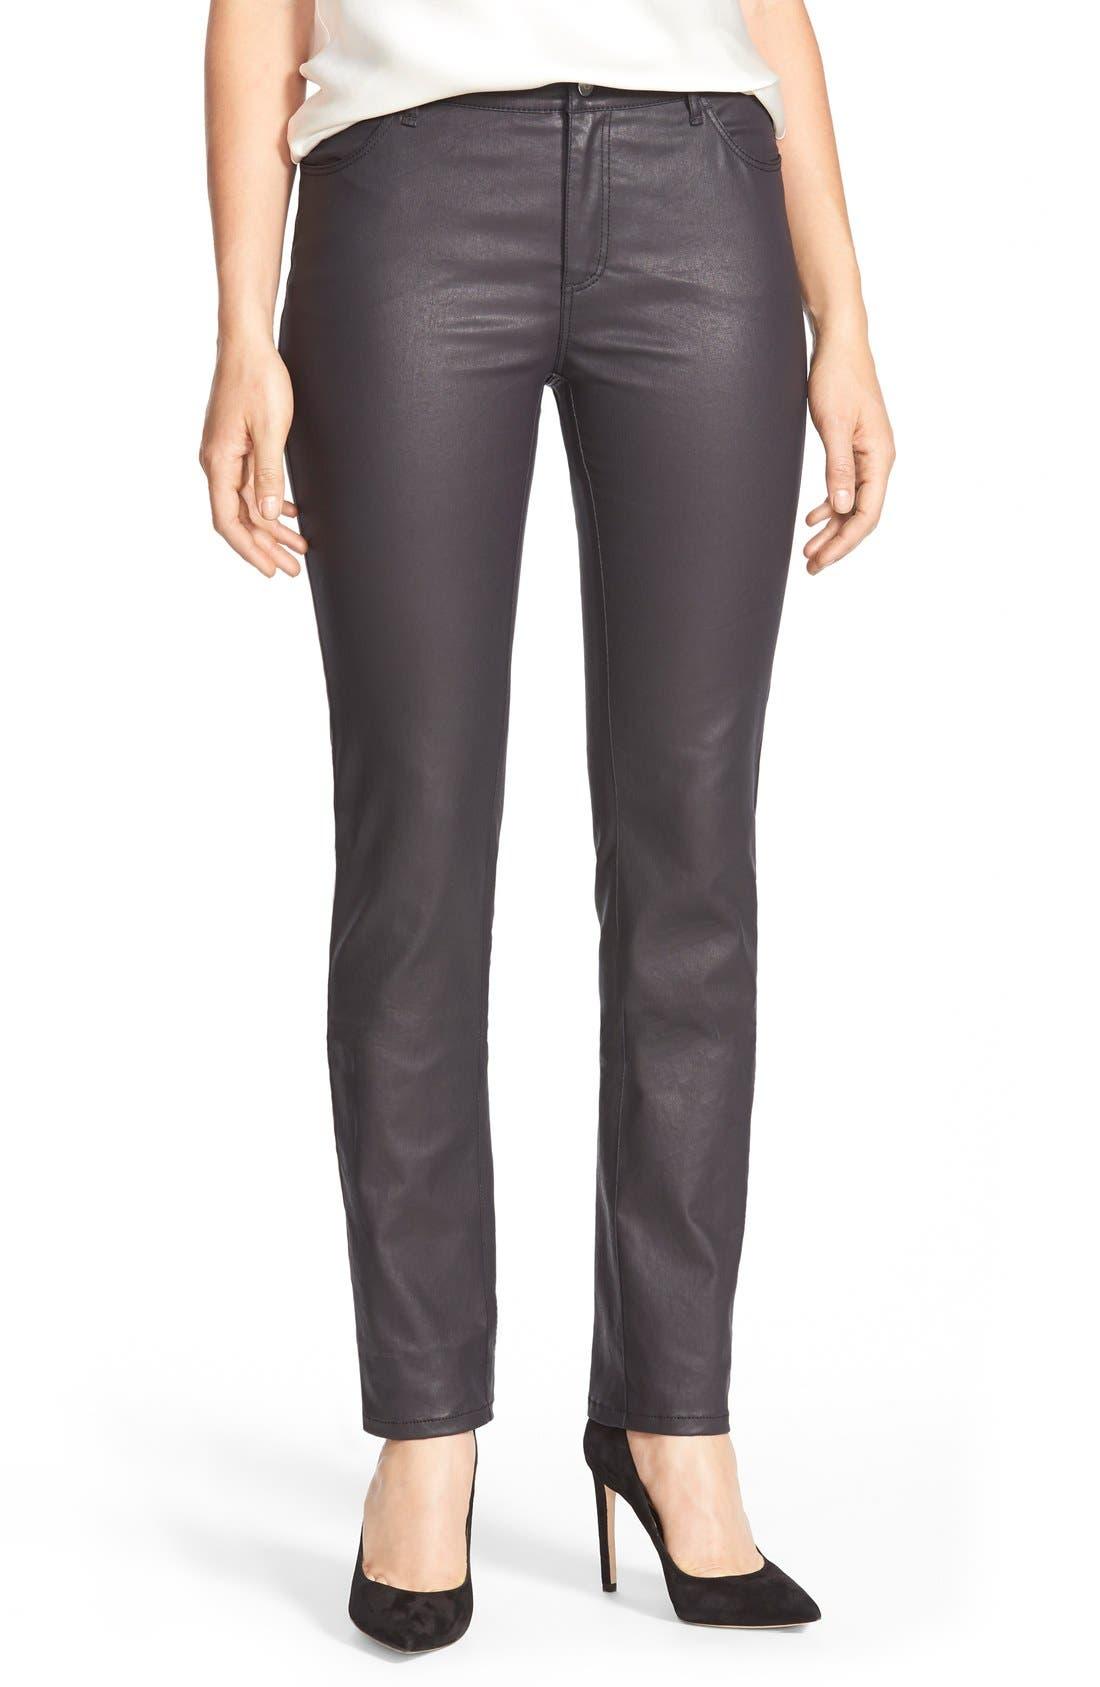 LAFAYETTE 148 NEW YORK, Waxed Denim Slim Leg Jeans, Main thumbnail 1, color, INK